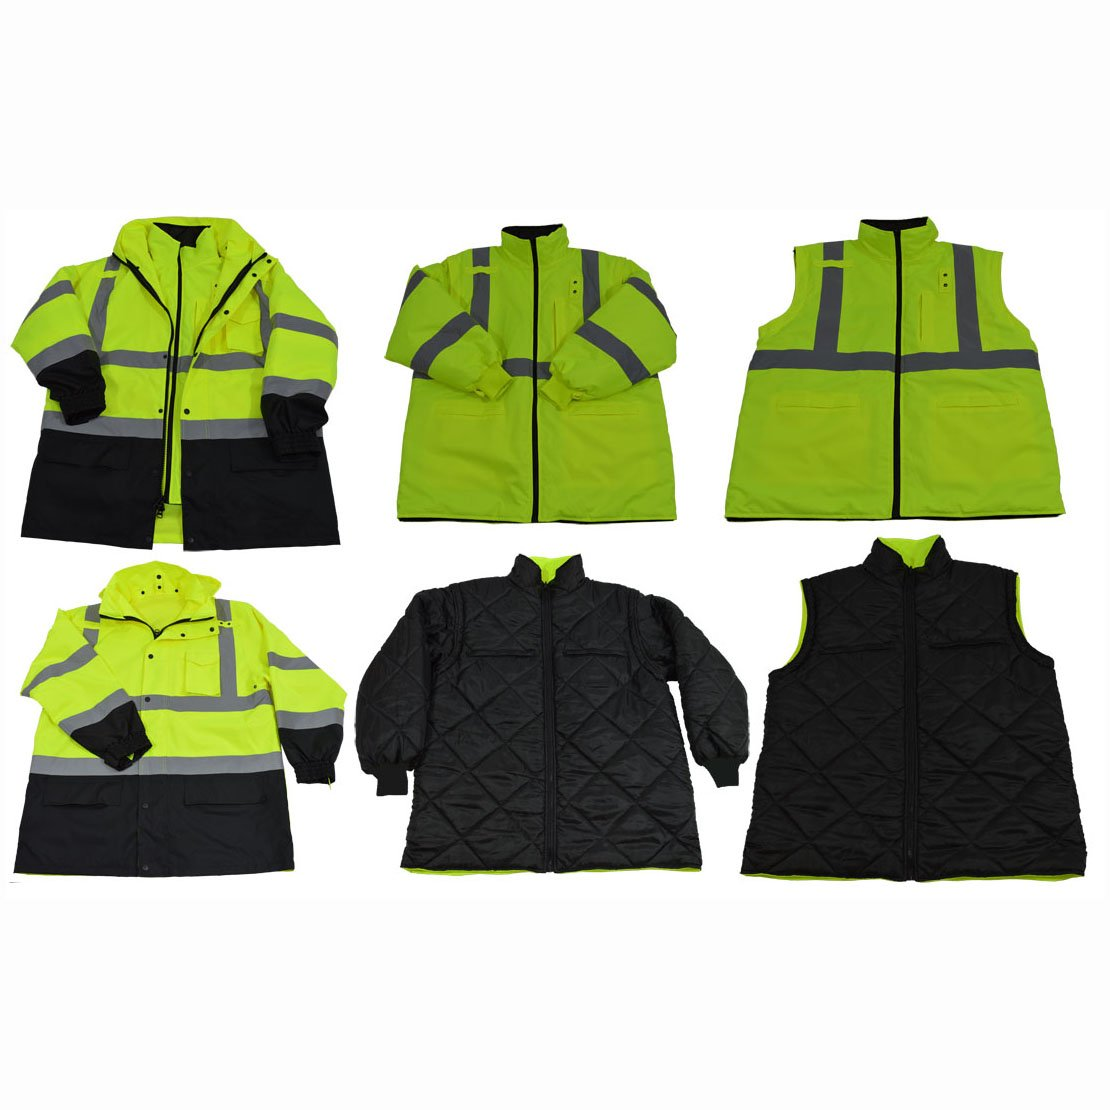 Petra Roc LBPJ6IN1-C3-L Two Tone Waterproof 6-In-1 Parka Jacket, Large, Lime/Black